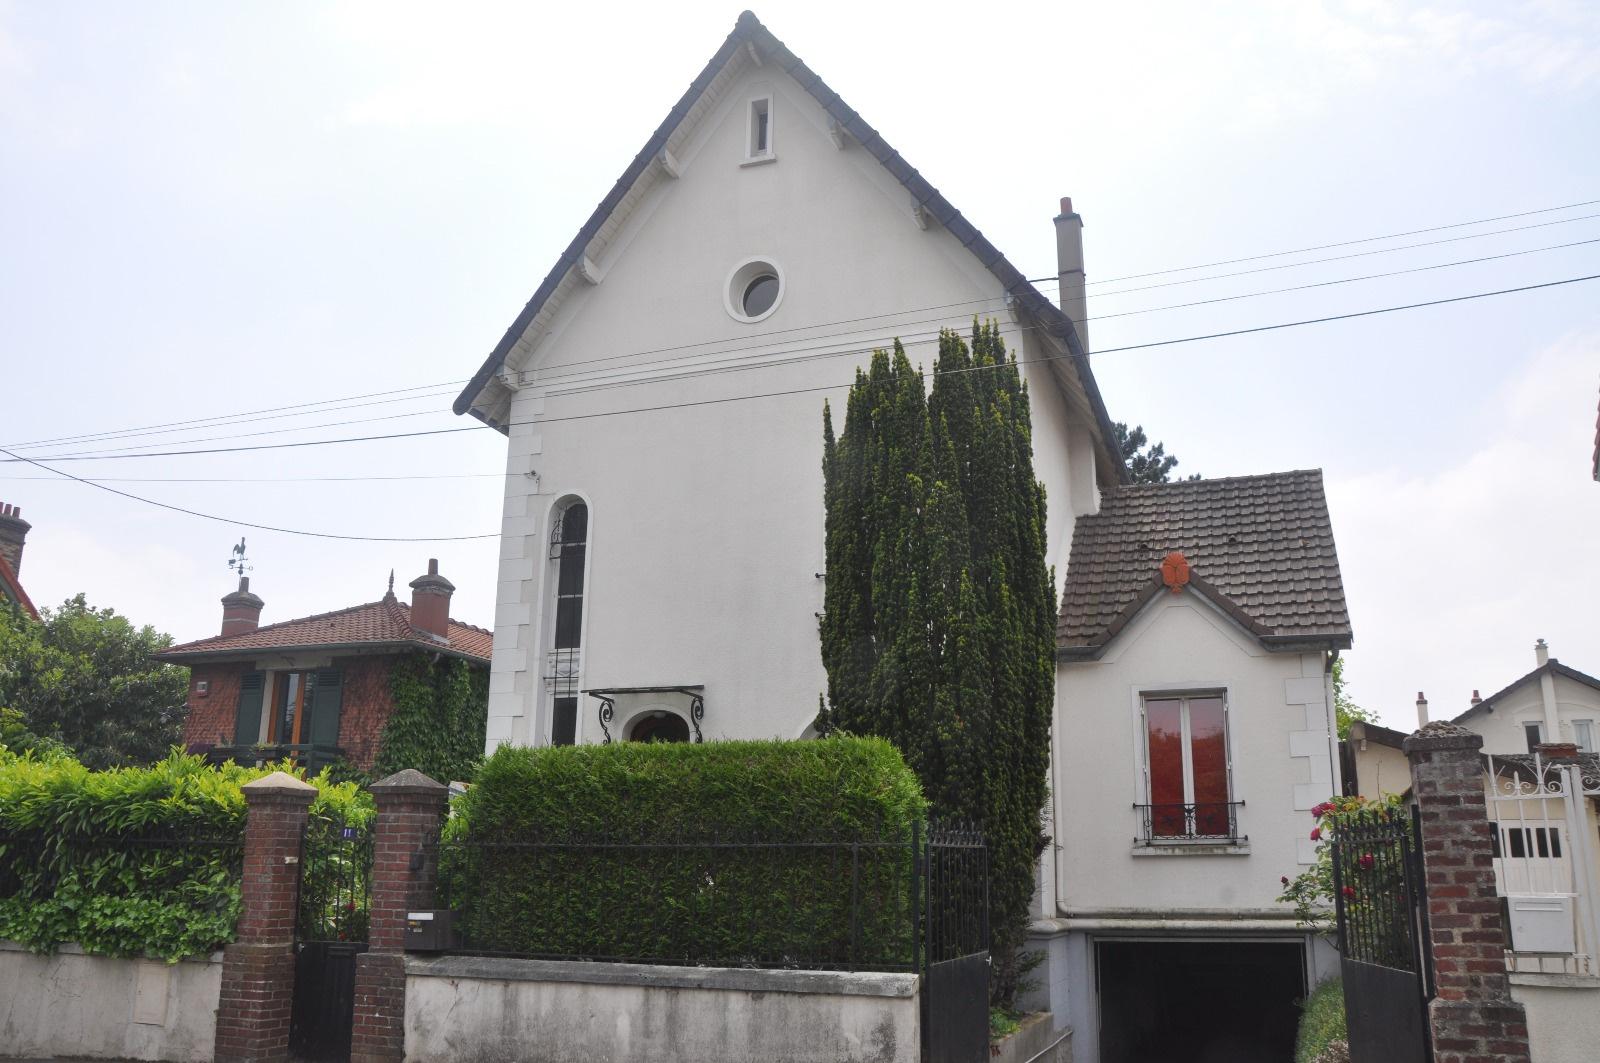 Salle De Bain Eaudace ~ Vente Ezanville Belle Demeure De Caractere